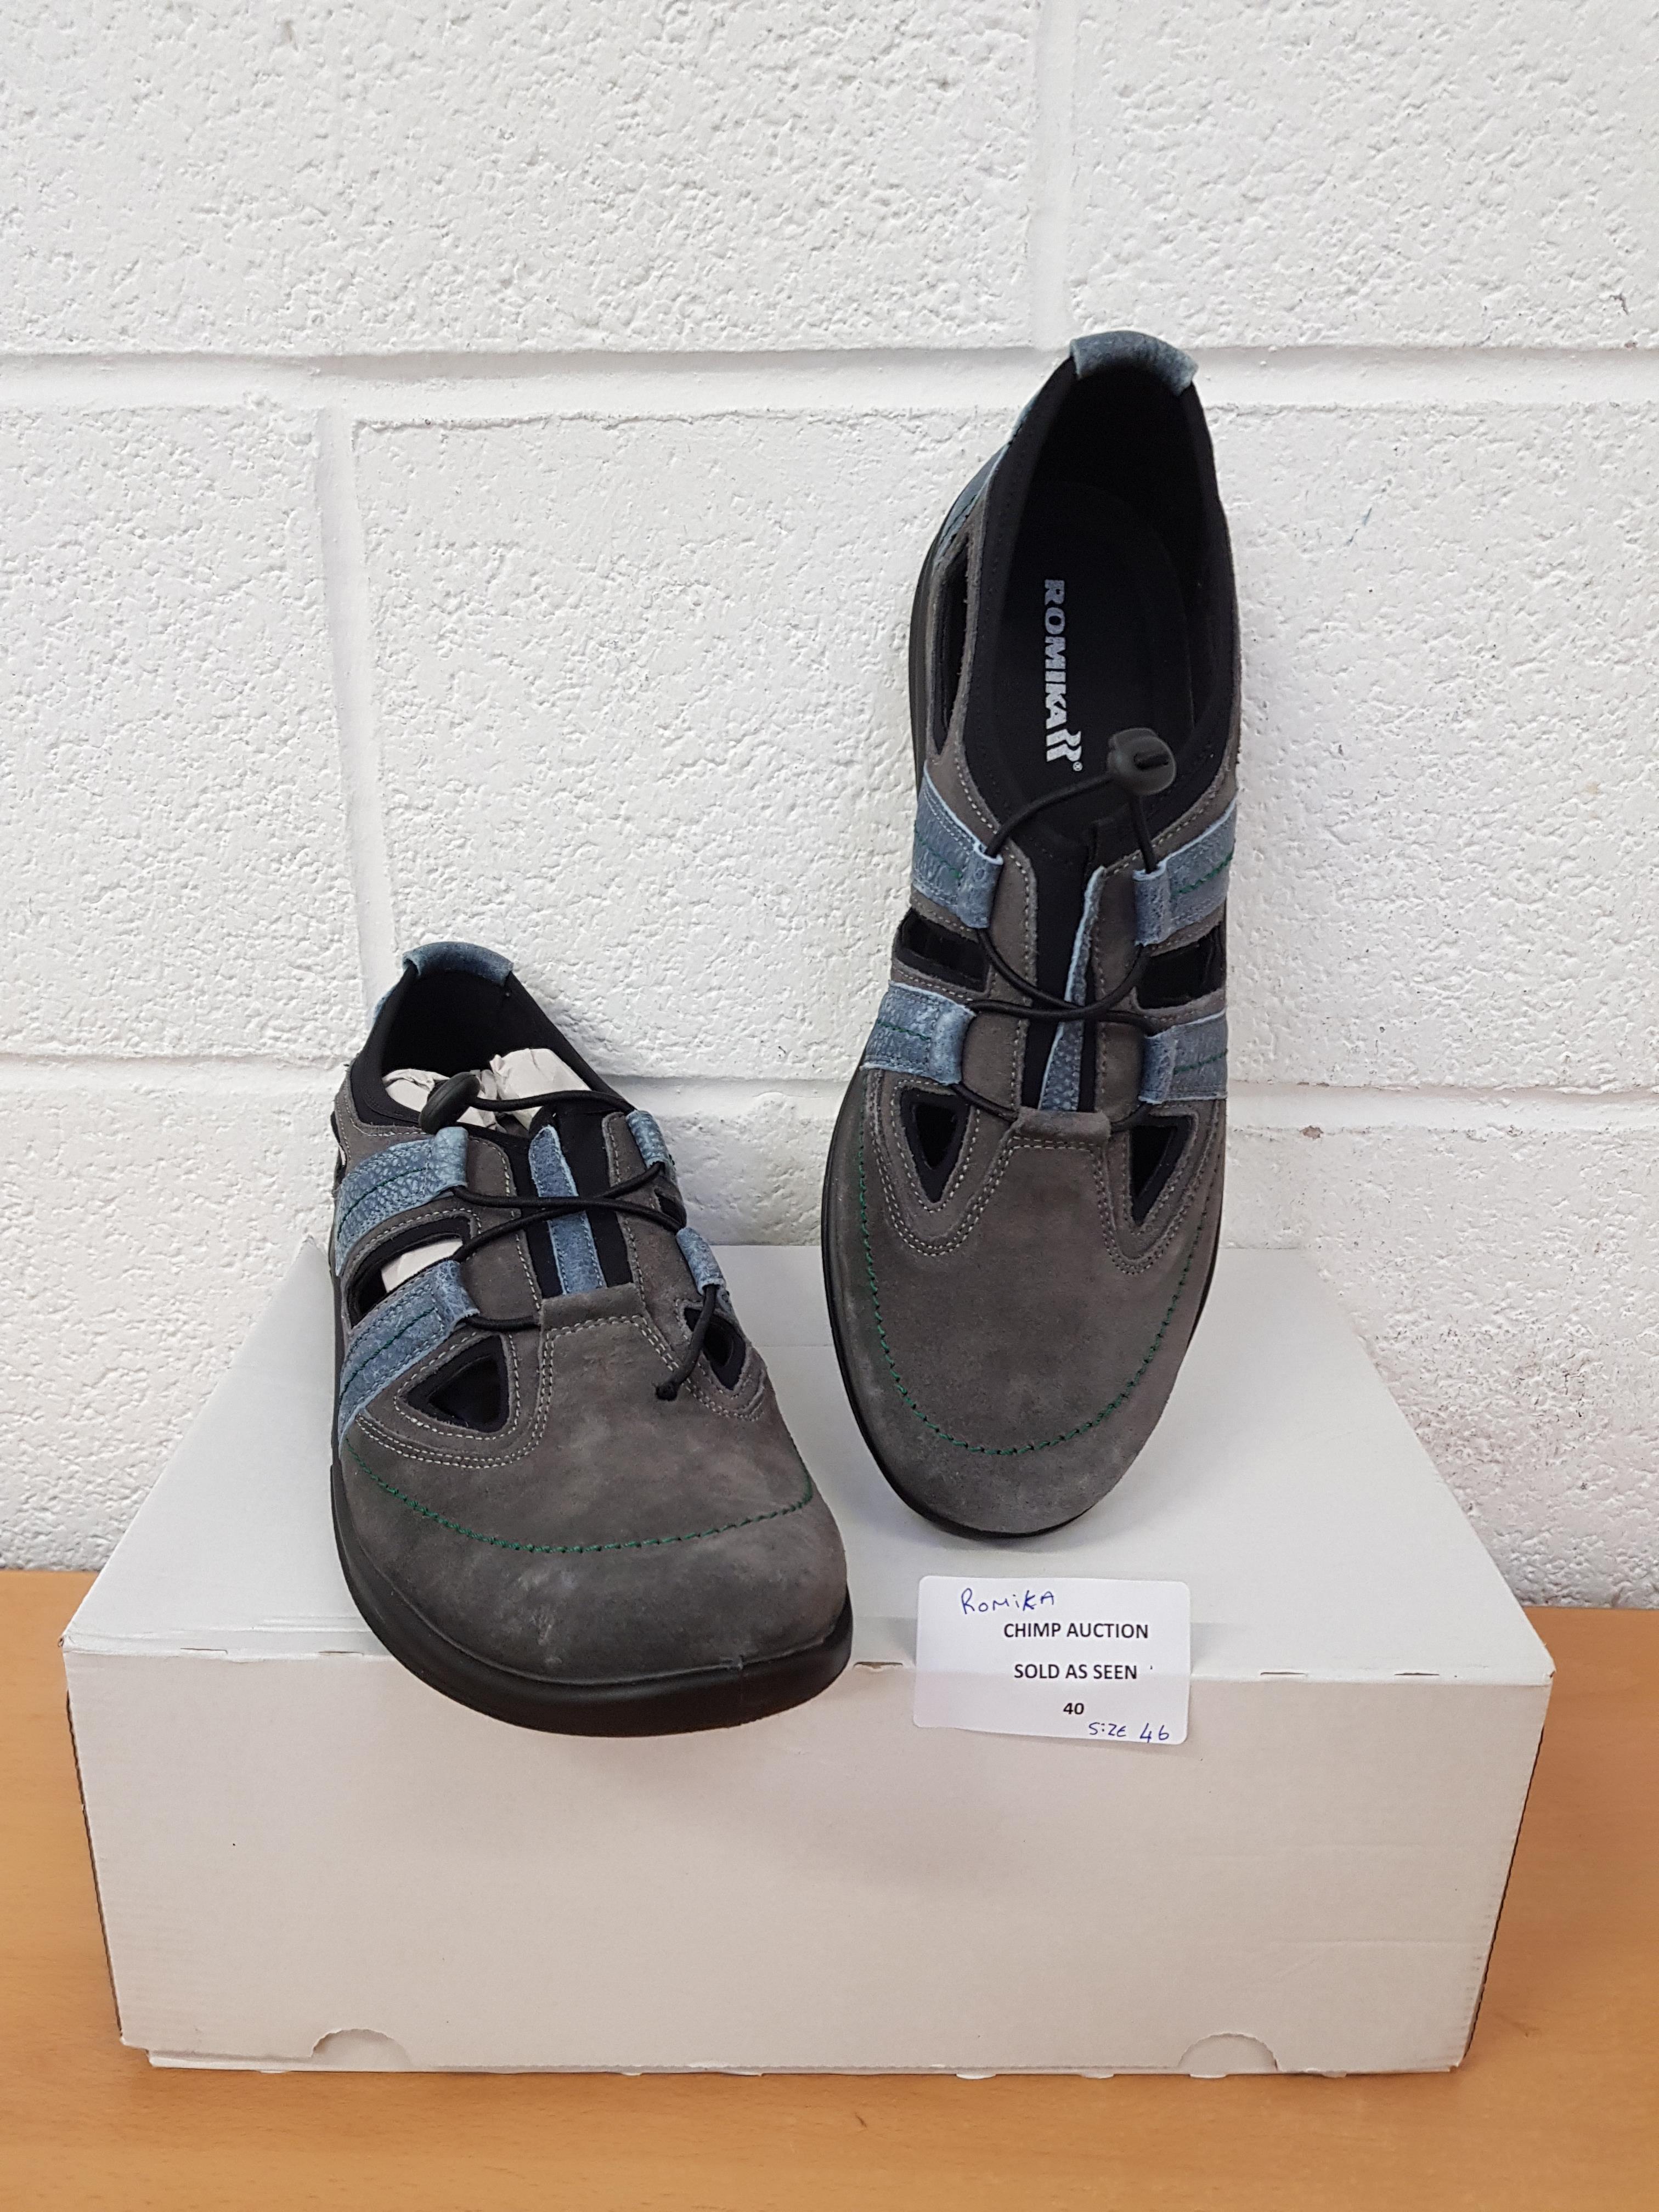 Lot 40 - Romika men's shoes EU 46